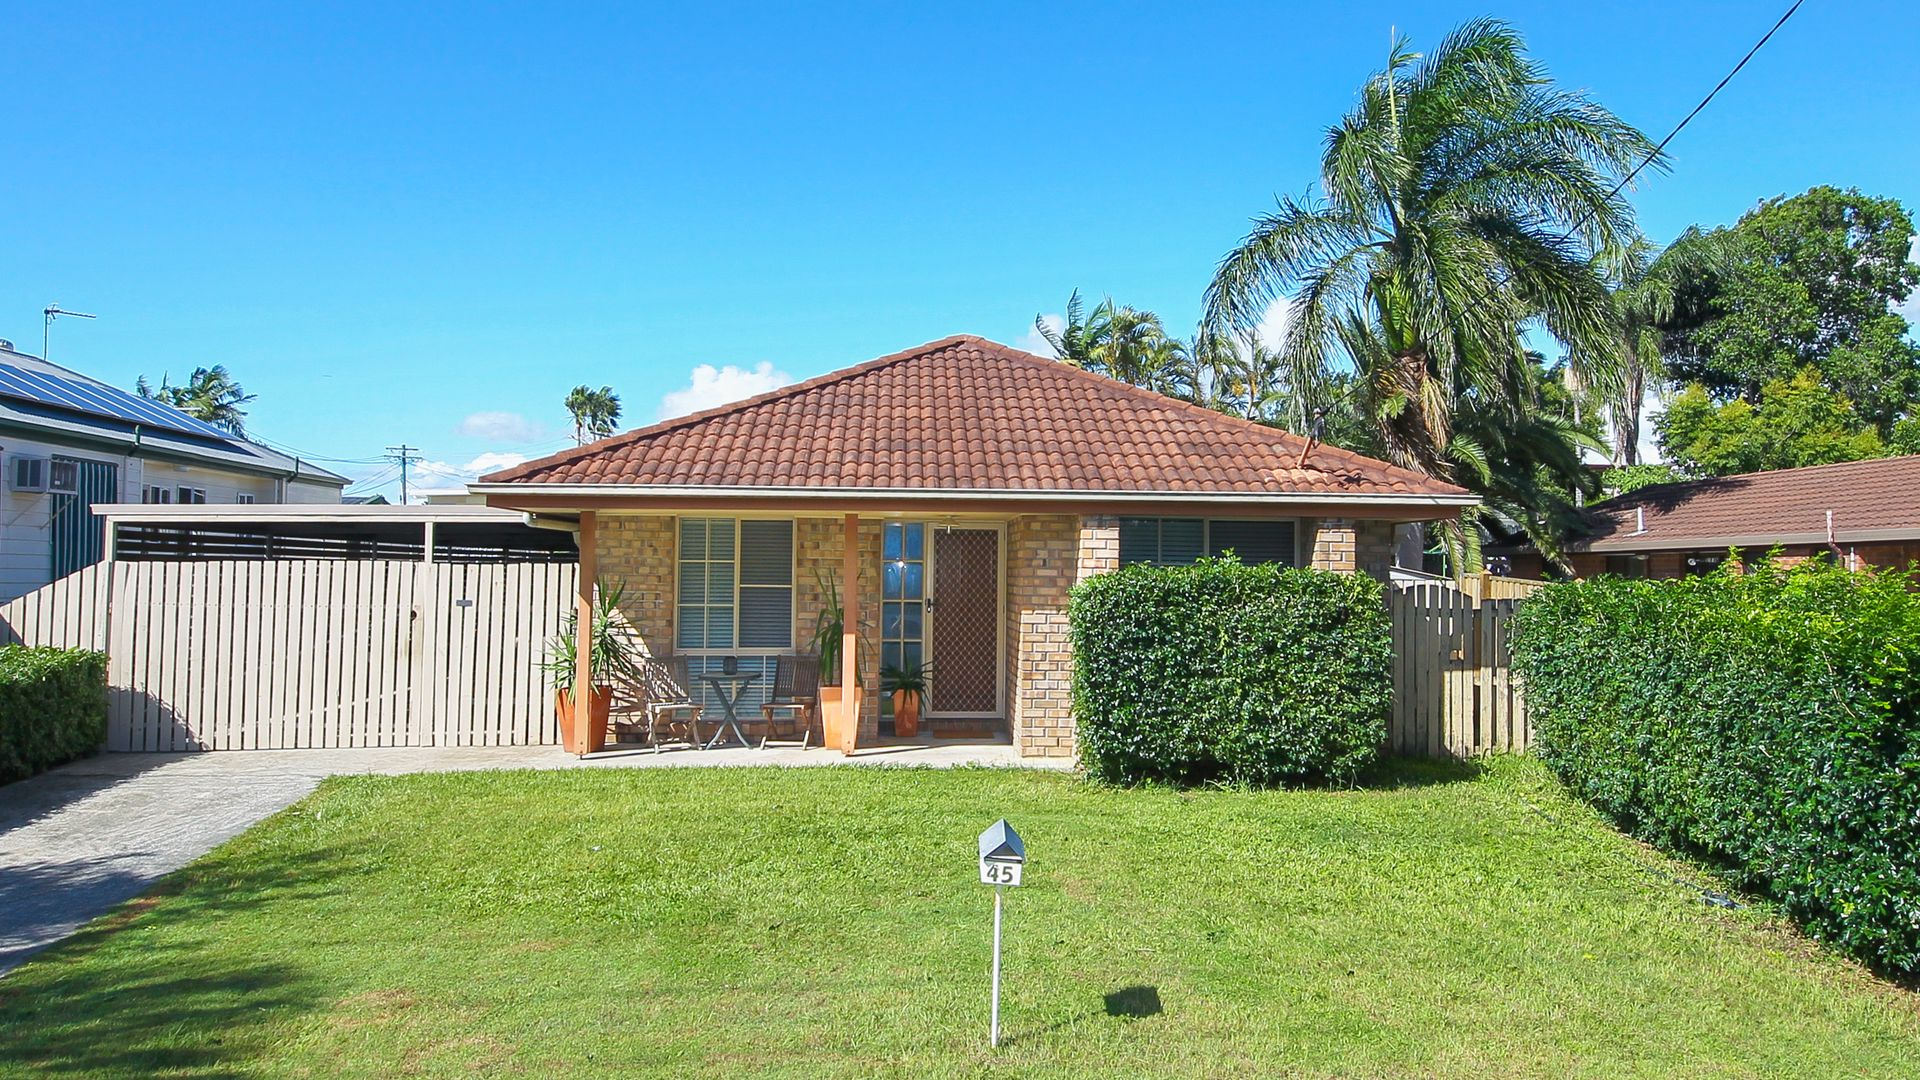 45 Tooraneedin Road, Coomera QLD 4209, Image 1